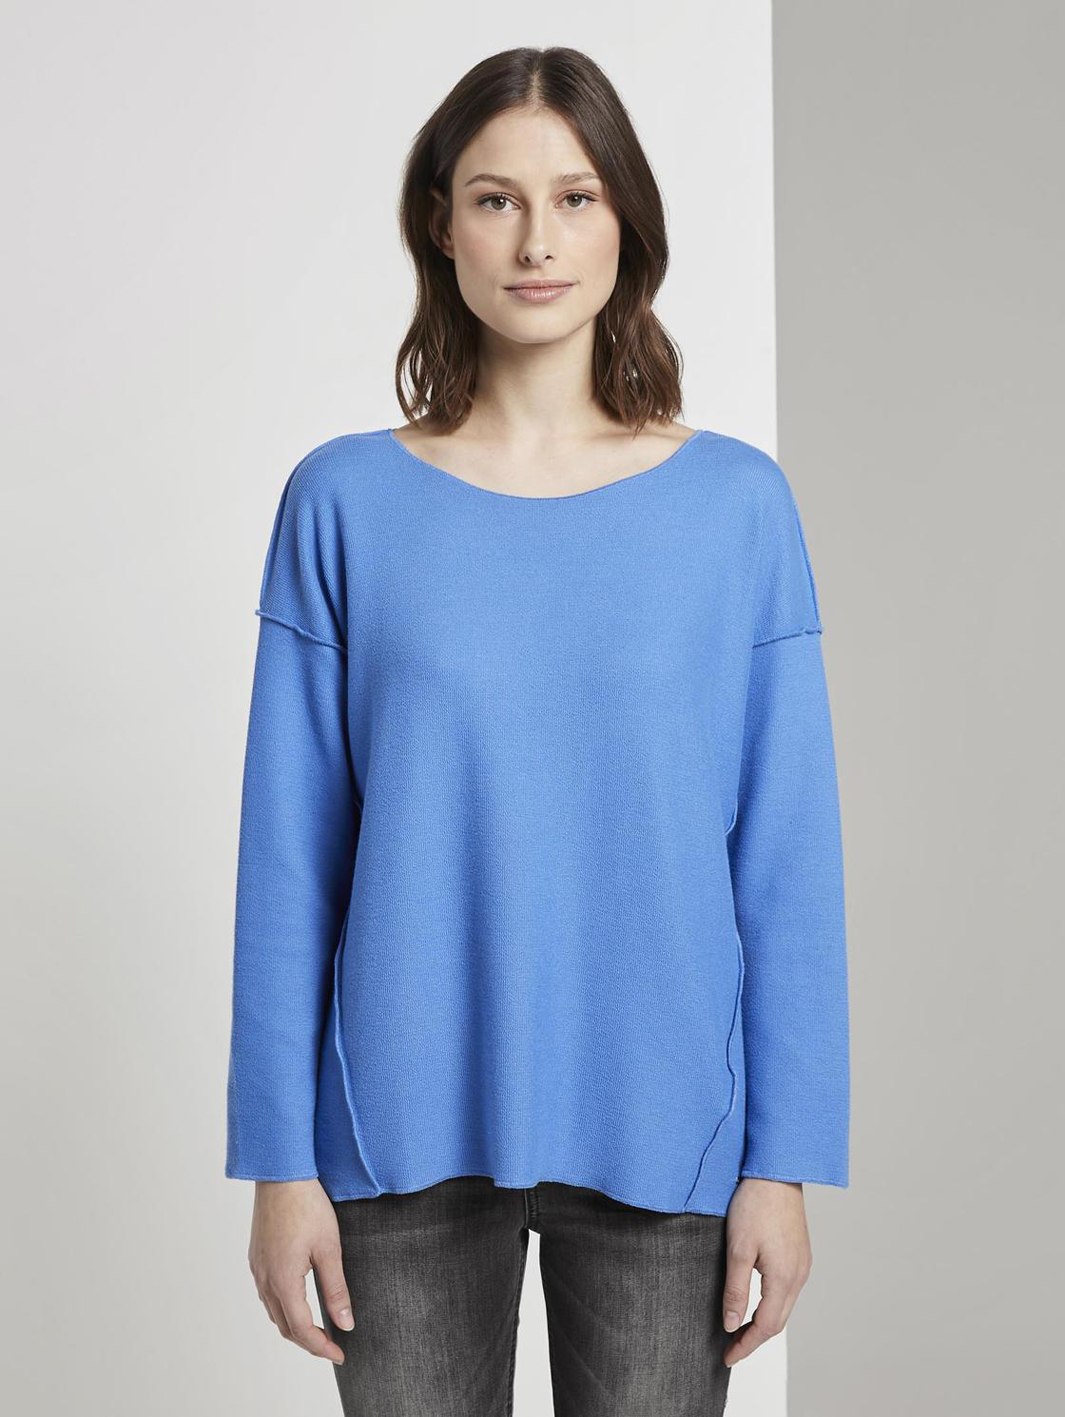 Tom Tailor geripptes Oversized Shirt blue